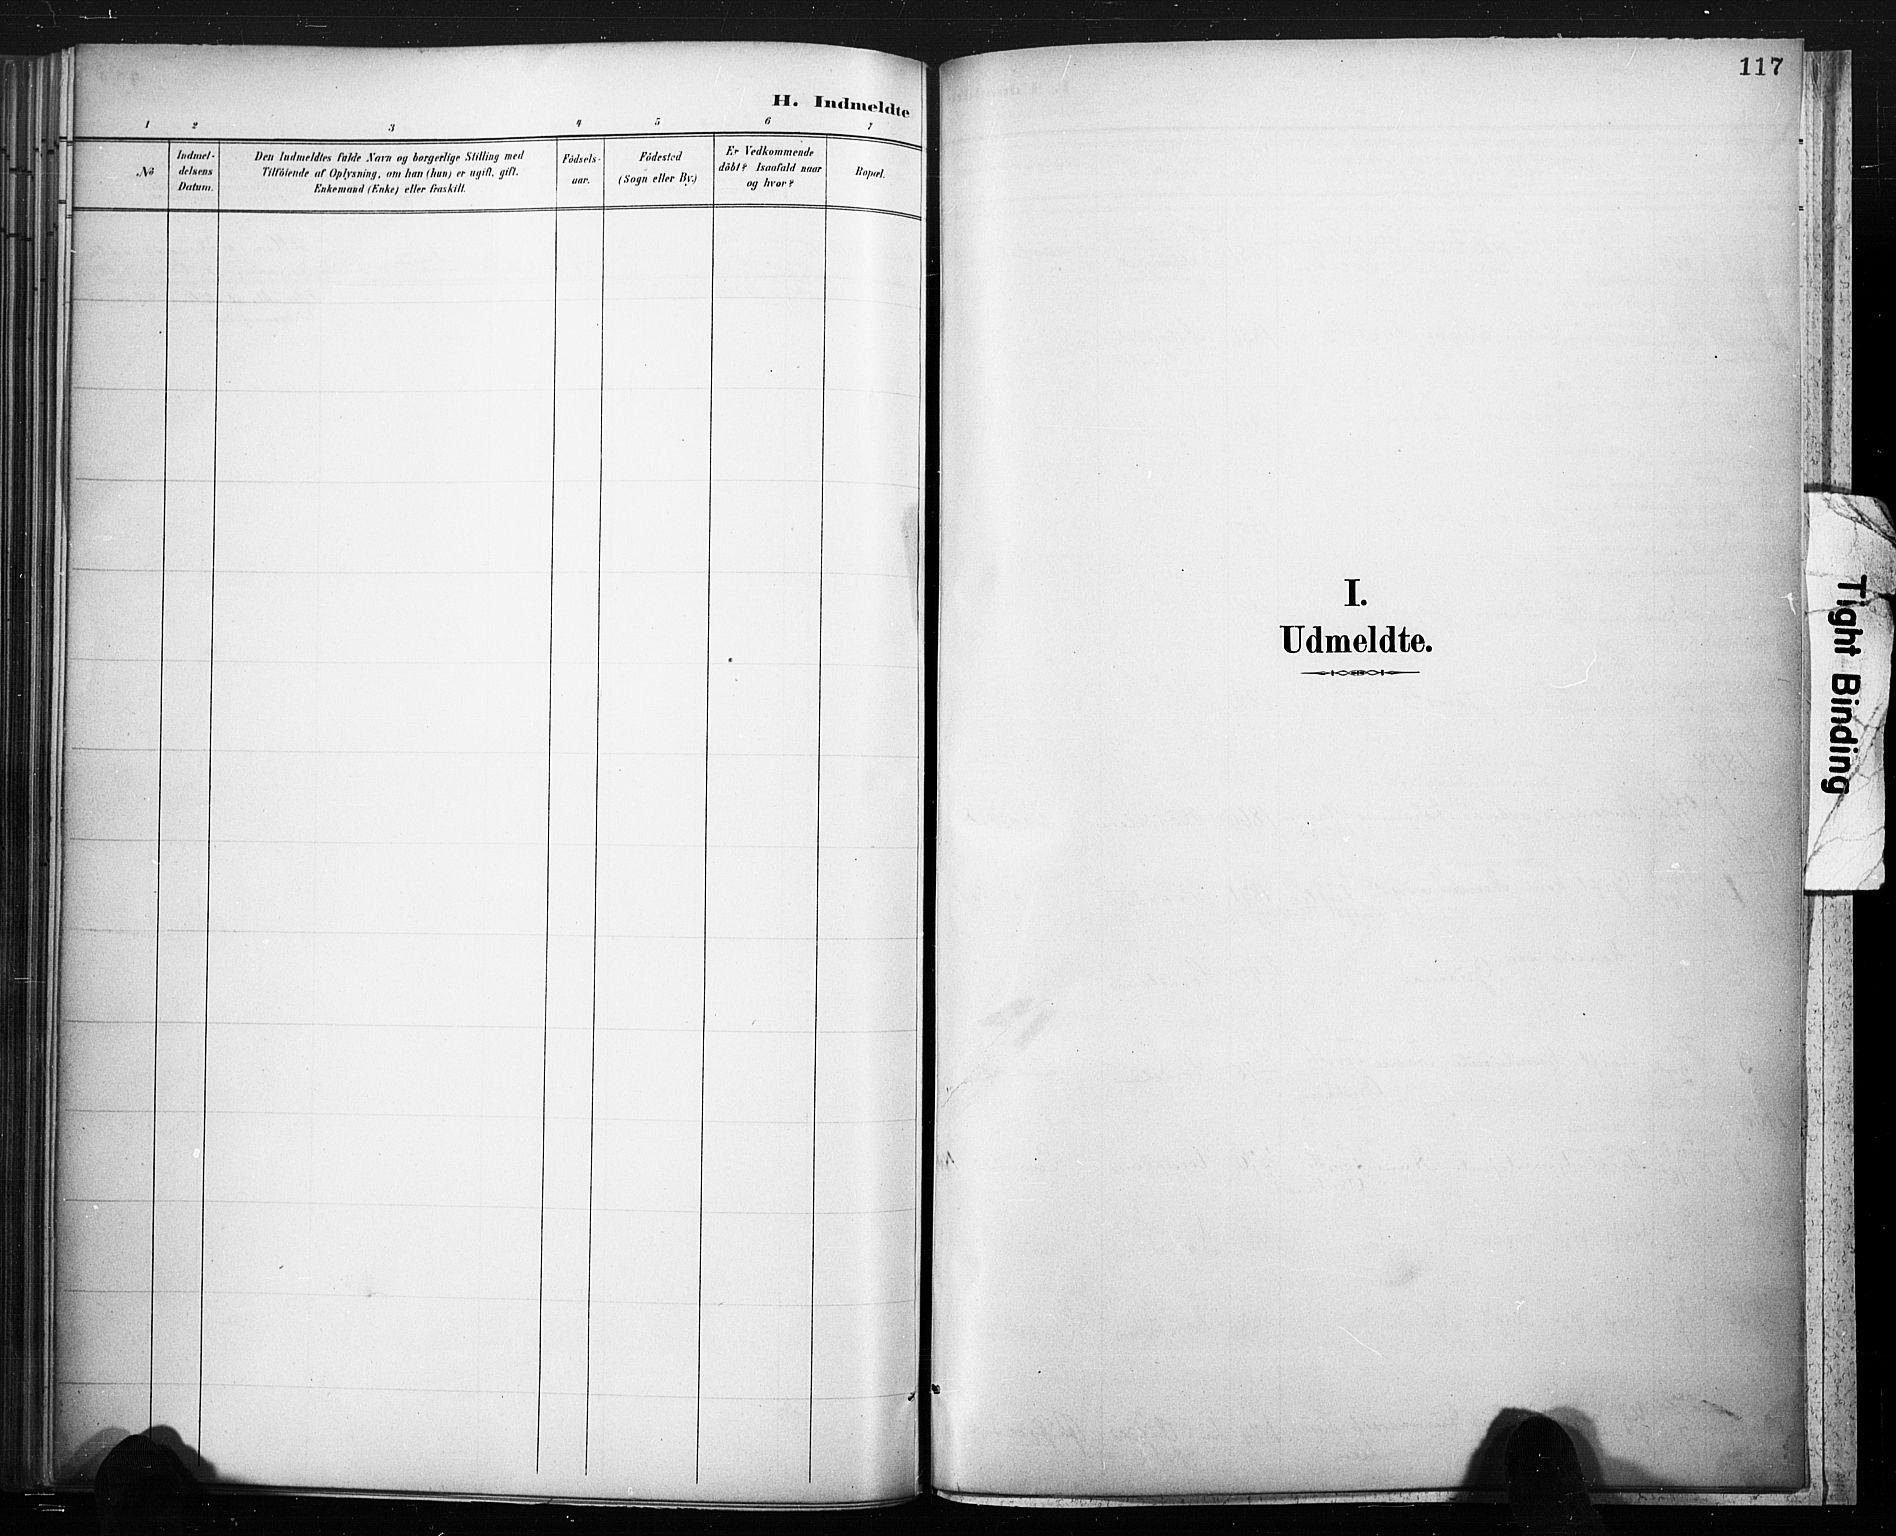 SAKO, Lårdal kirkebøker, F/Fc/L0002: Ministerialbok nr. III 2, 1887-1906, s. 117